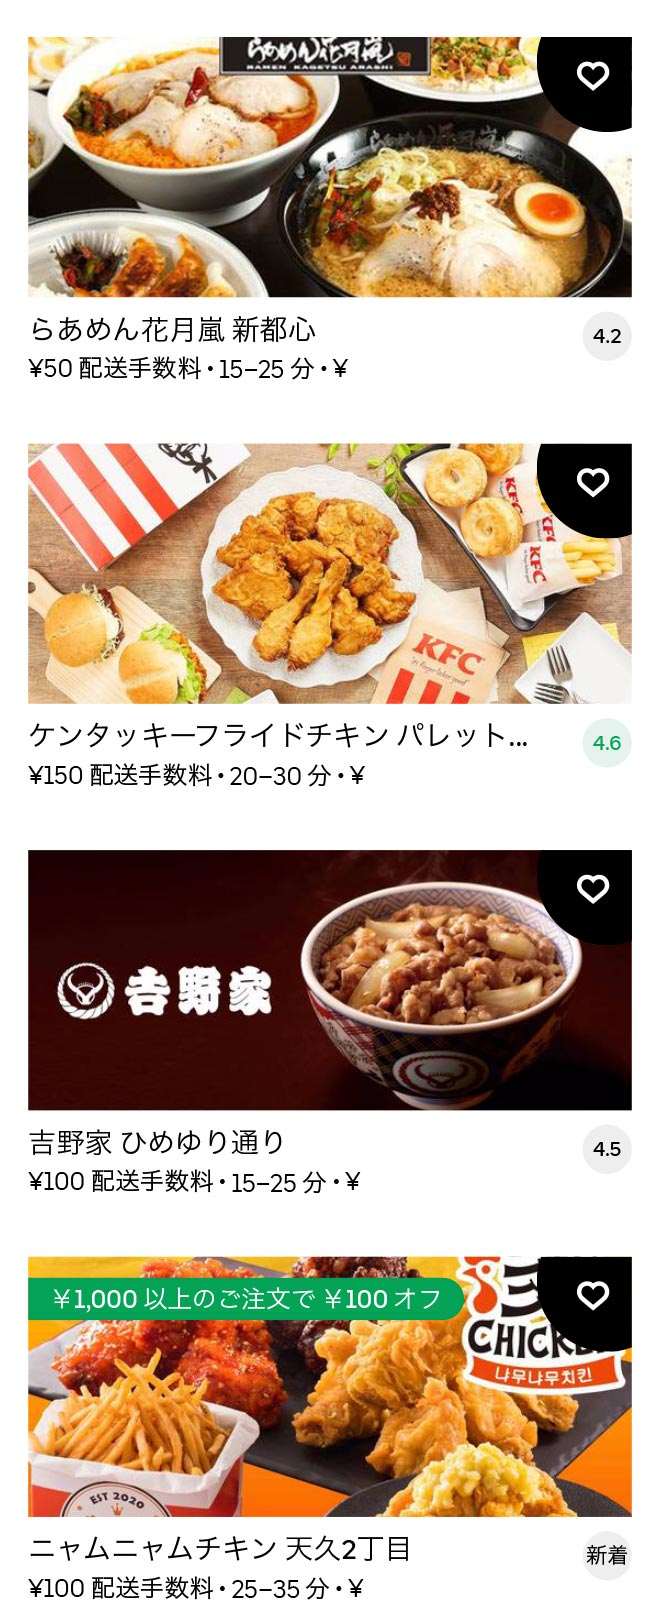 Omoromachi menu 2011 02